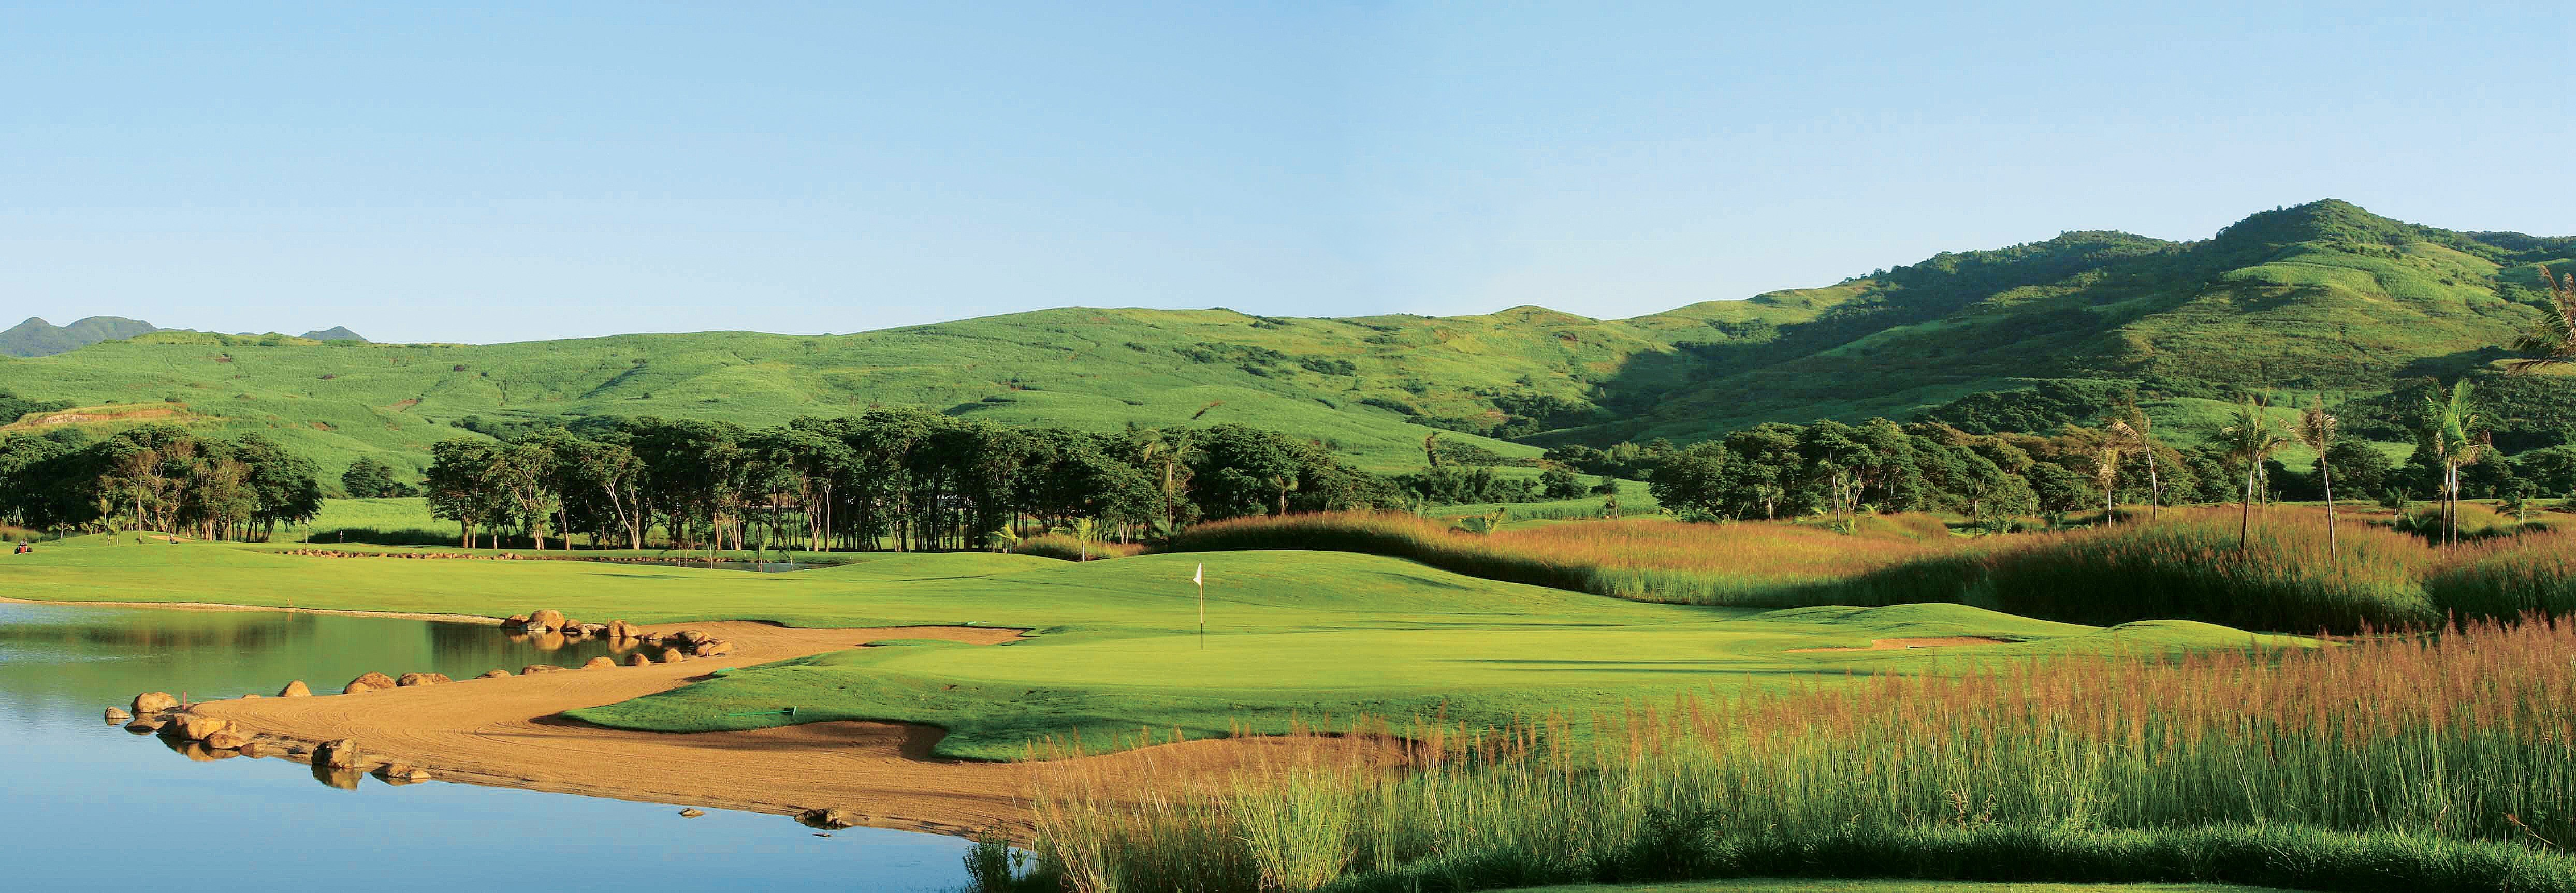 10 African golf courses | CNN Travel